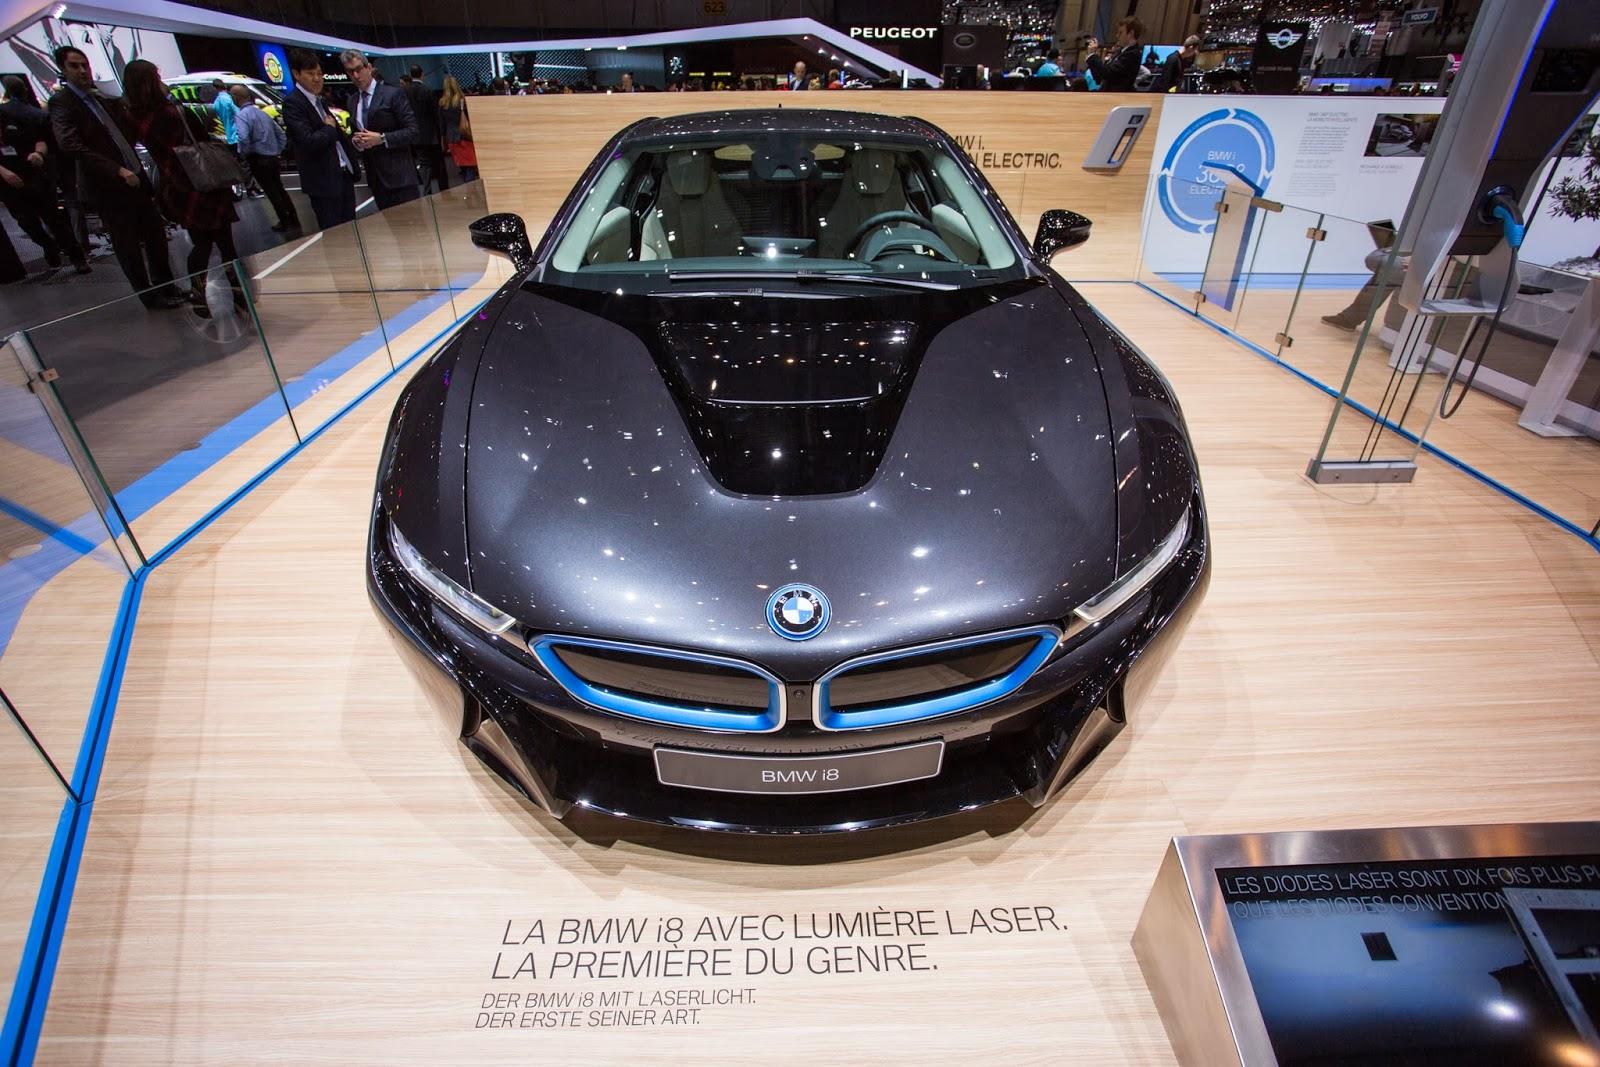 Auto Industry, Auto Show, Automobile, BMW, BMZ i8, Business, Cars, Citroen C4, Exhibition, Ford Focus, Geneva, Geneva Motor Show, Motor Show, News, Technology, Twingo, Vredestein,